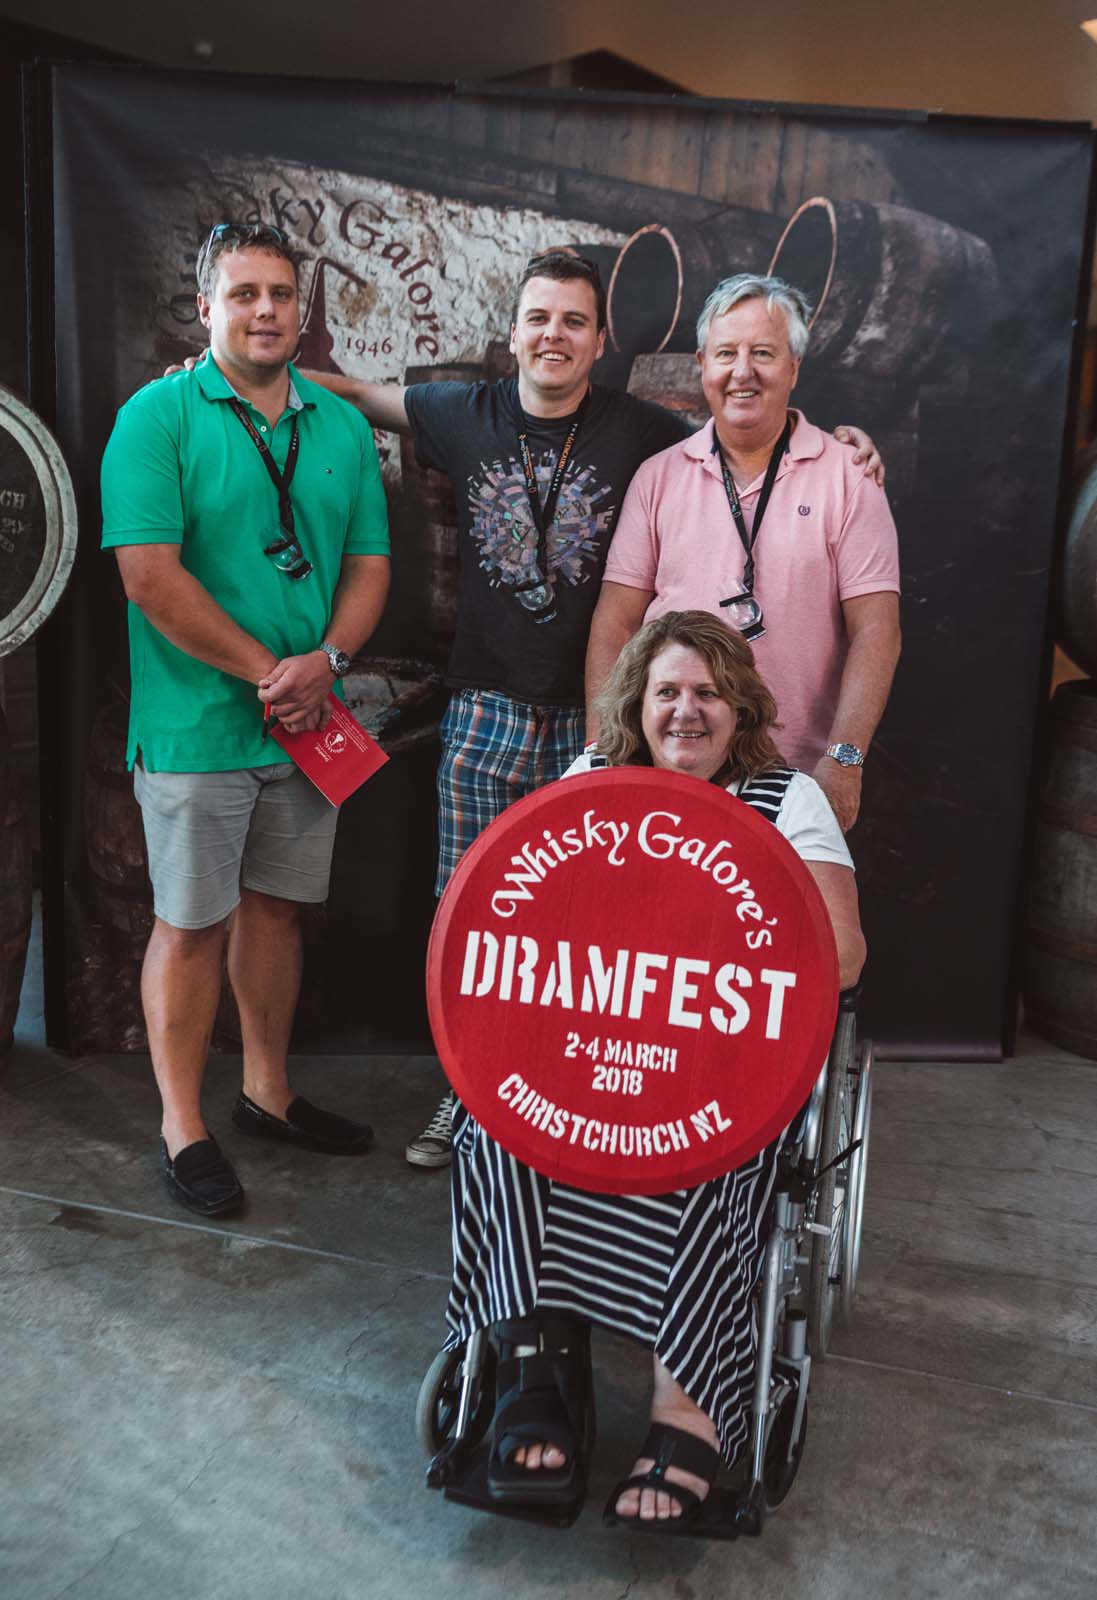 Dramfest 2018 for Whisky Galore-143.jpg